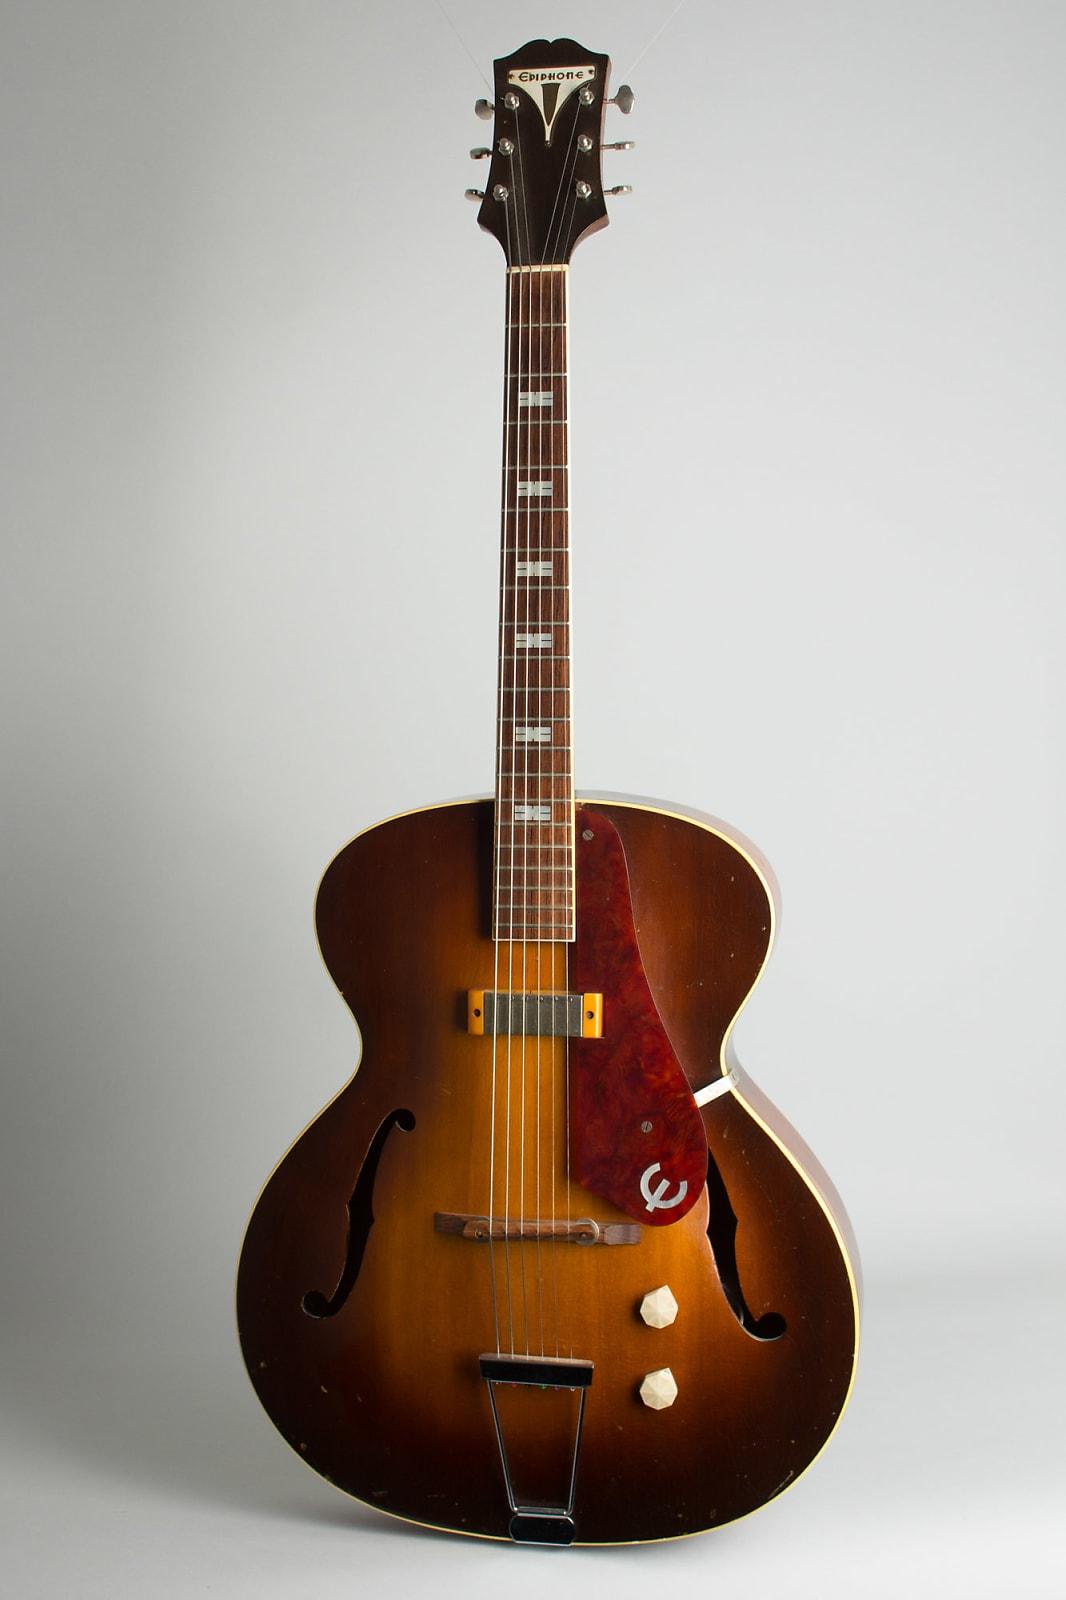 Epiphone  Zephyr Arch Top Hollow Body Electric Guitar (1949), ser. #25768, black tolex hard shell case.